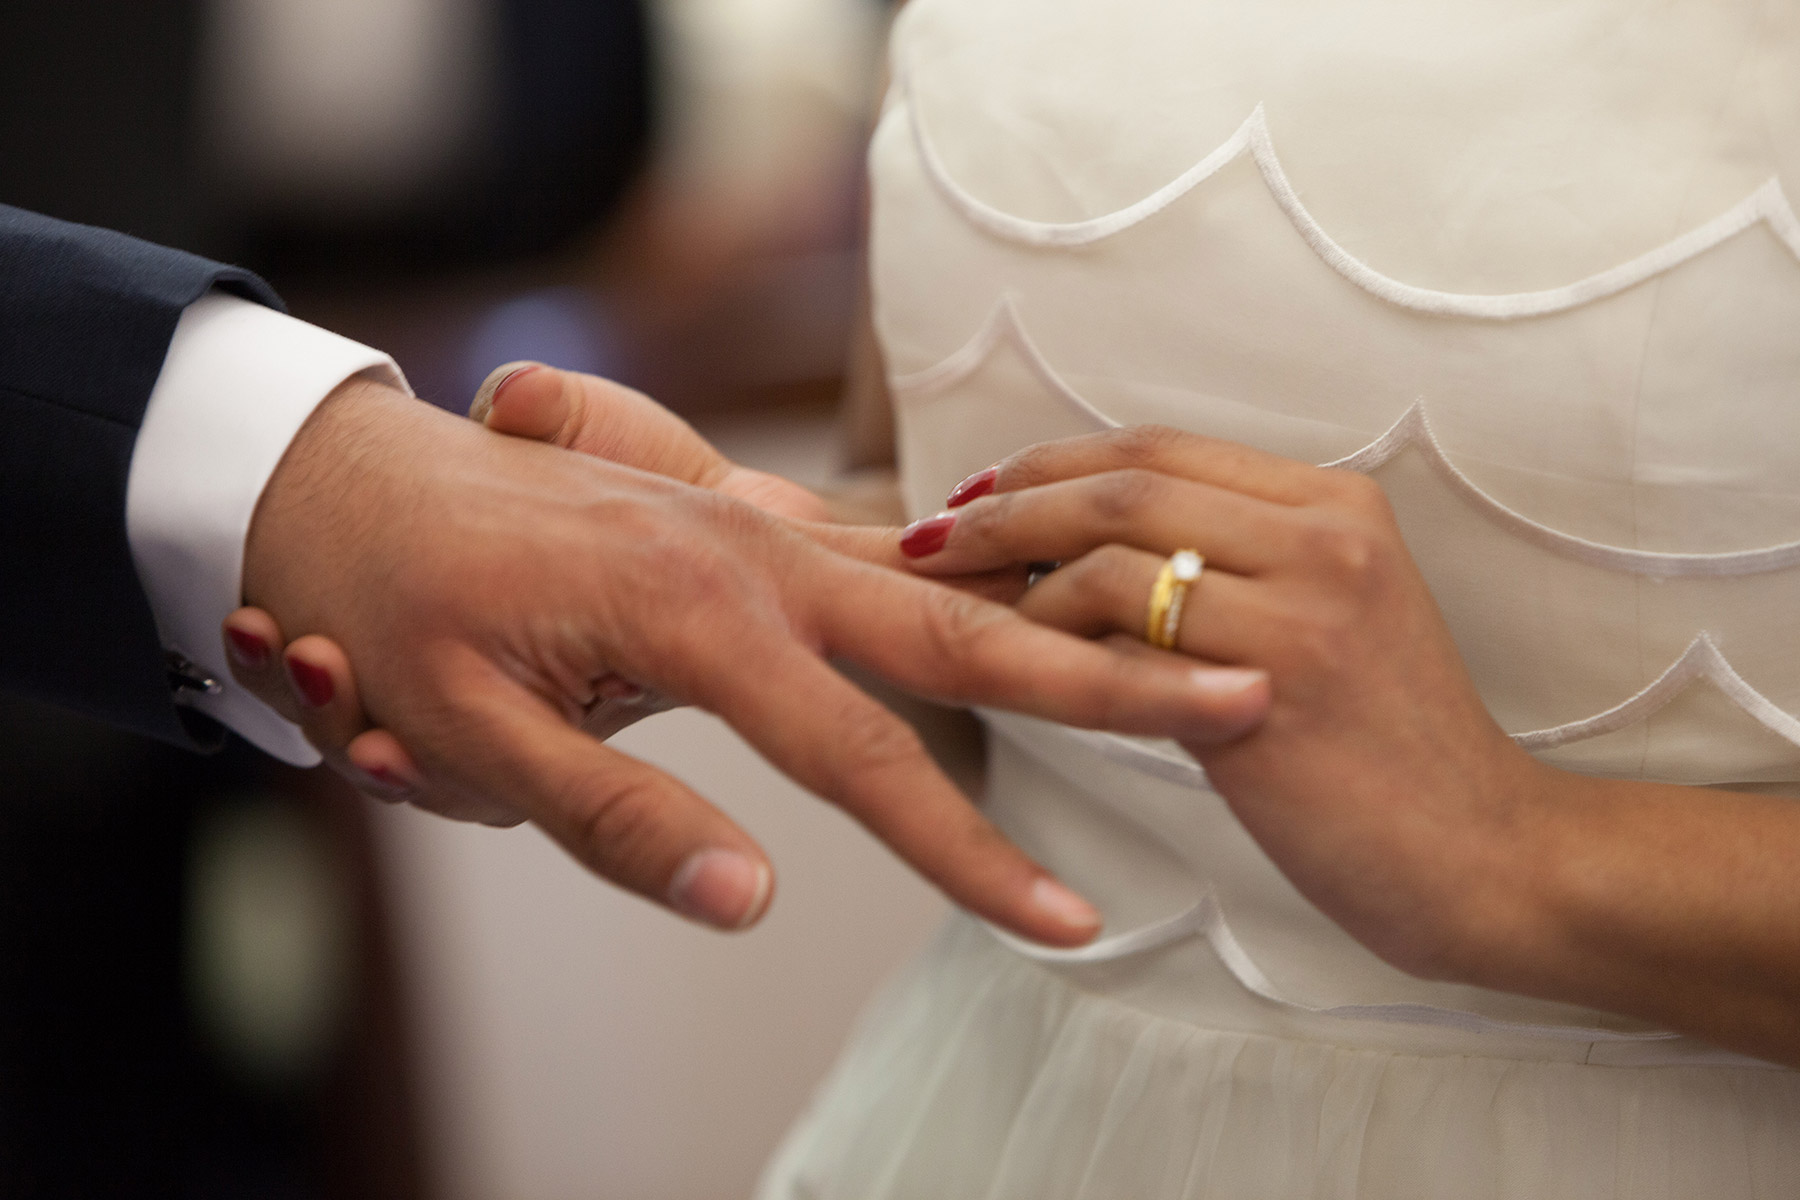 Jobcenter Muss Bei Hartz Iv Bezug Nicht Fur Hochzeit Aufkommen Hartziv Org